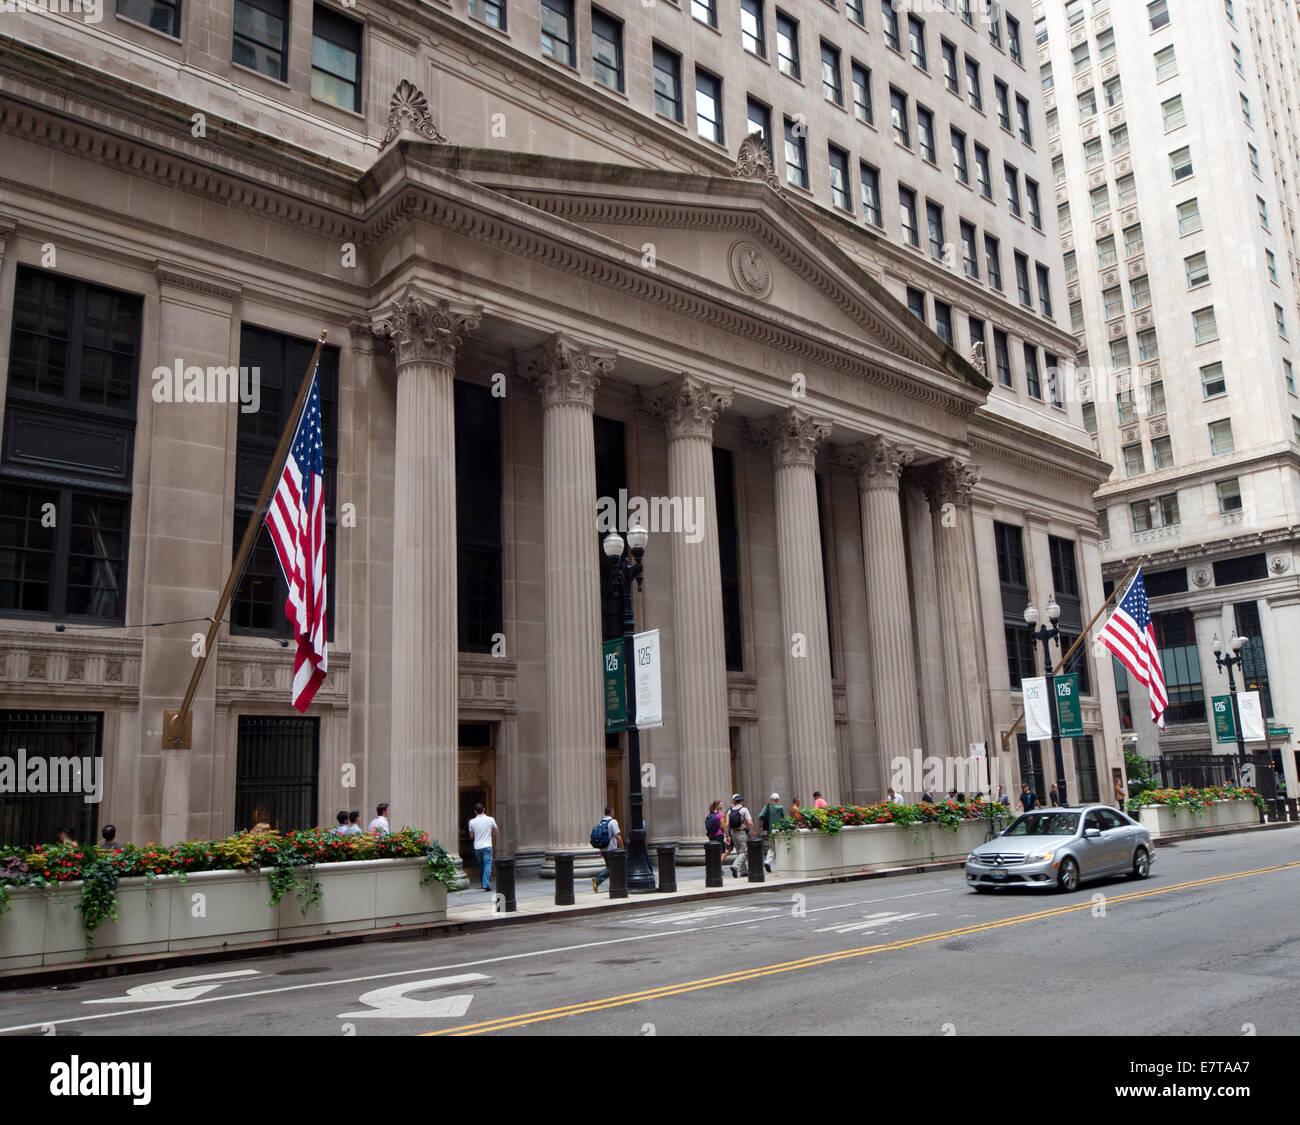 Image result for chicago federal reserve bank